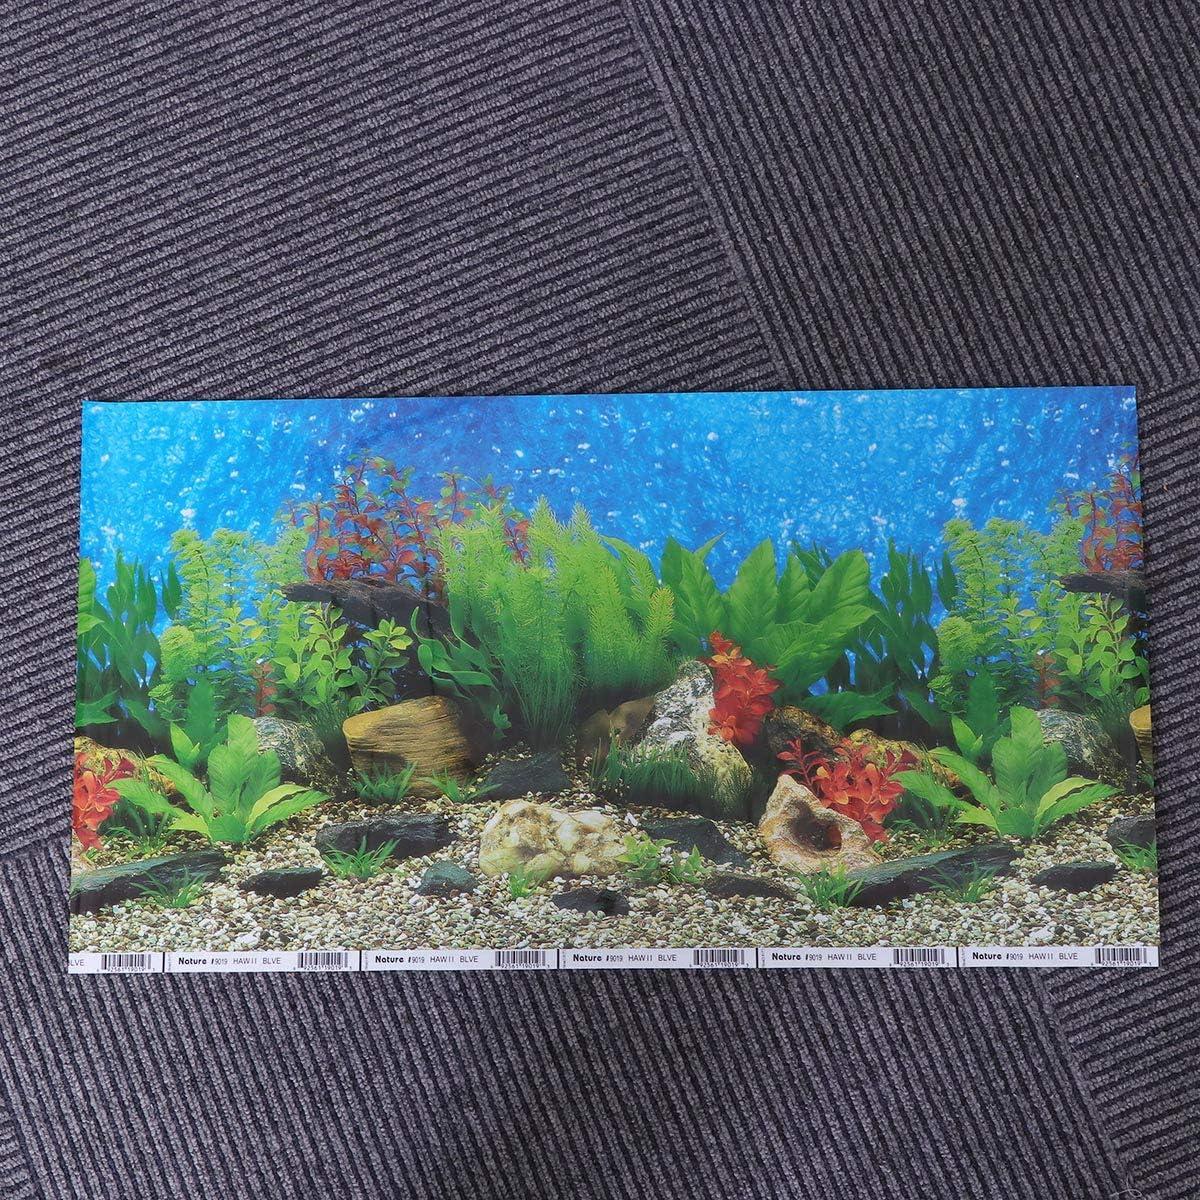 52x30cm POPETPOP Aquarium Fish Tank Background Sticker,3D Double-Sided Adhesive Wallpaper Fish Tank Decorative Pictures Underwater Backdrop Image Decor